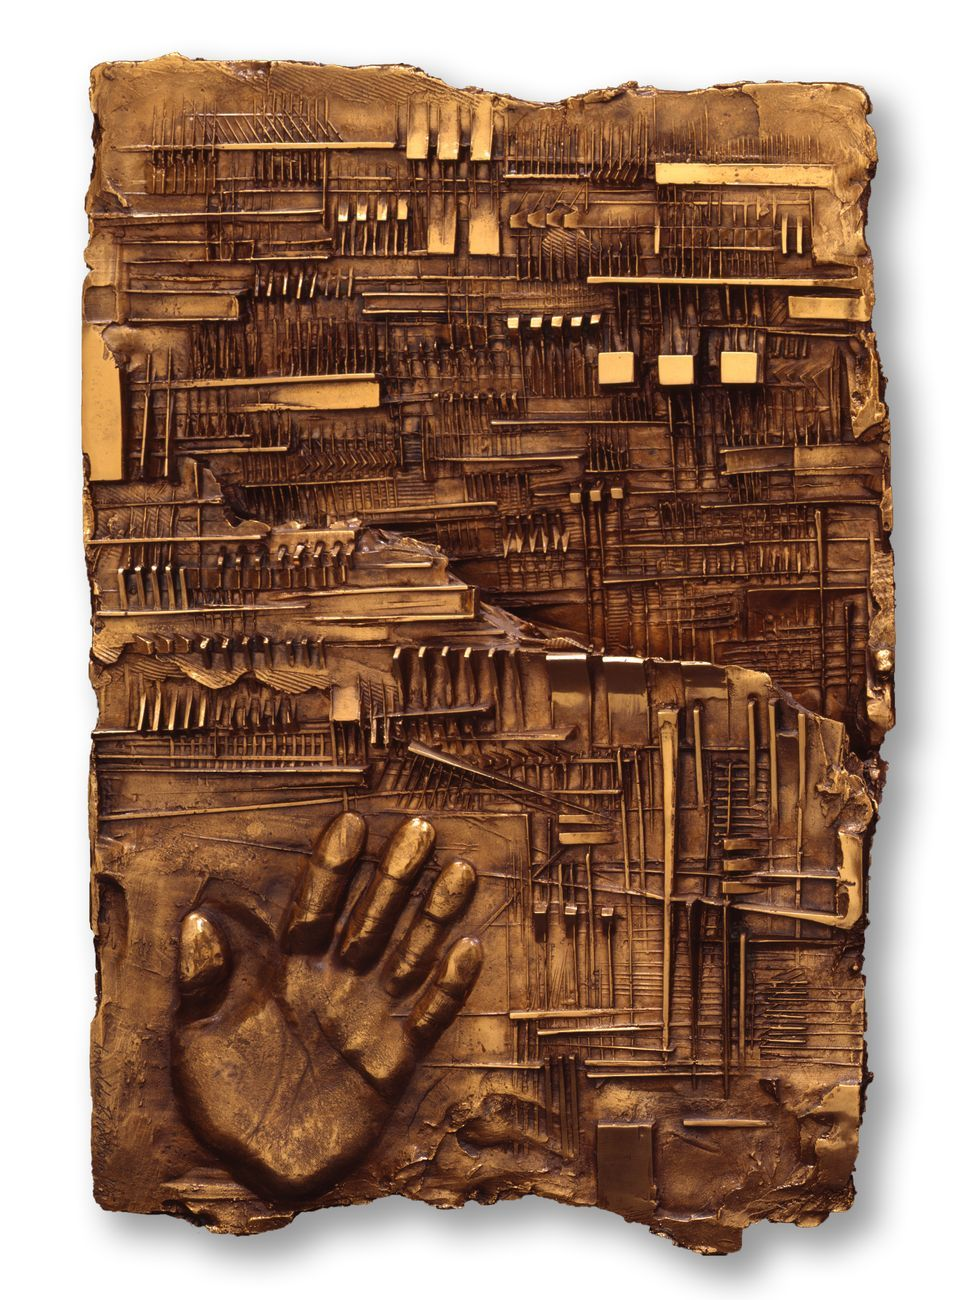 Arnaldo Pomodoro, Lettera a K, 1965, bronzo, 56x37x9,5 cm. Photo Aurelio Barbareschi